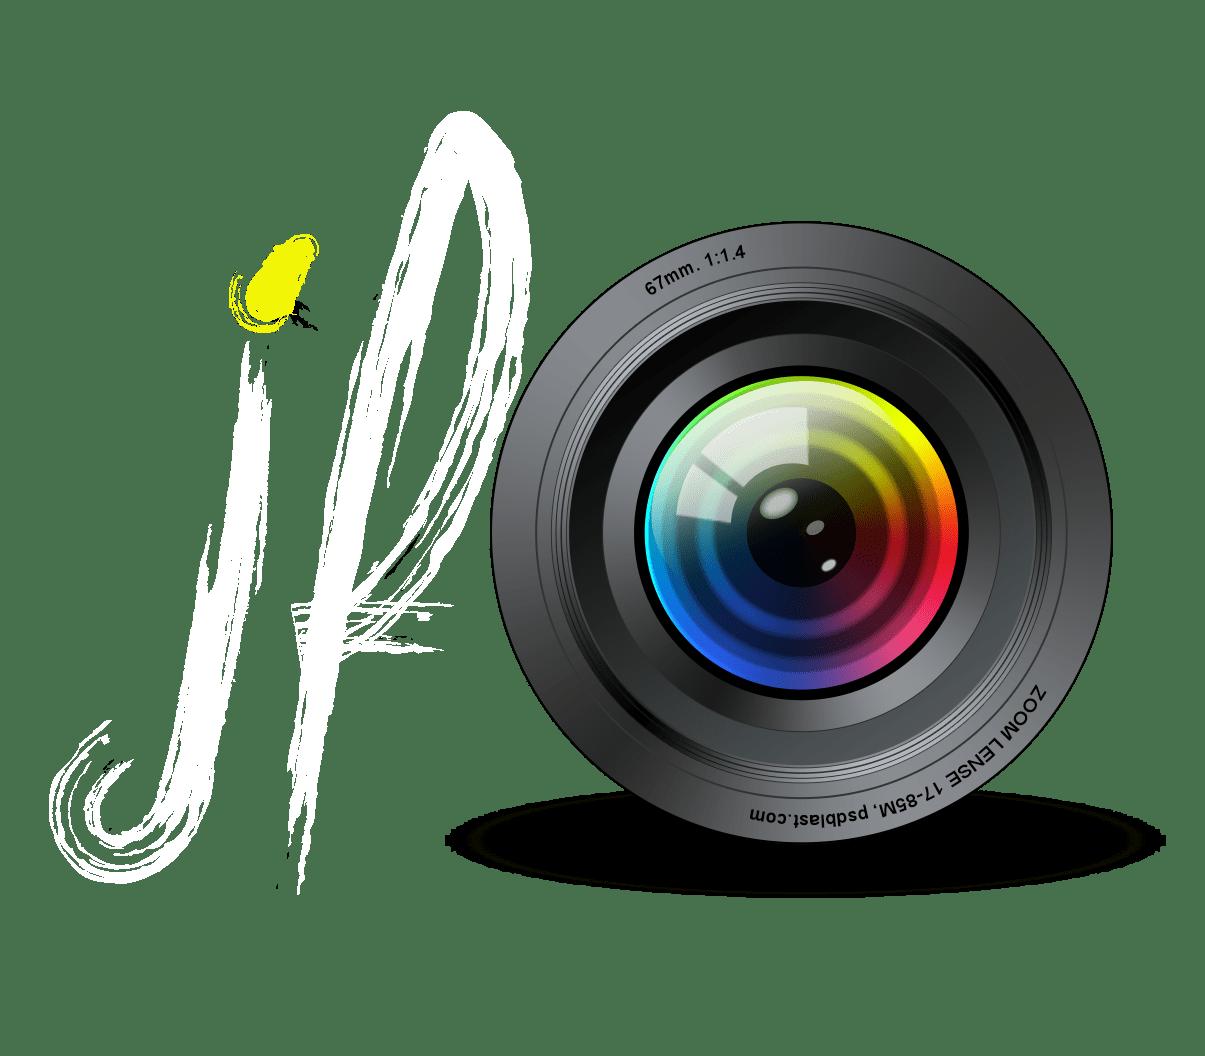 JFfotografia